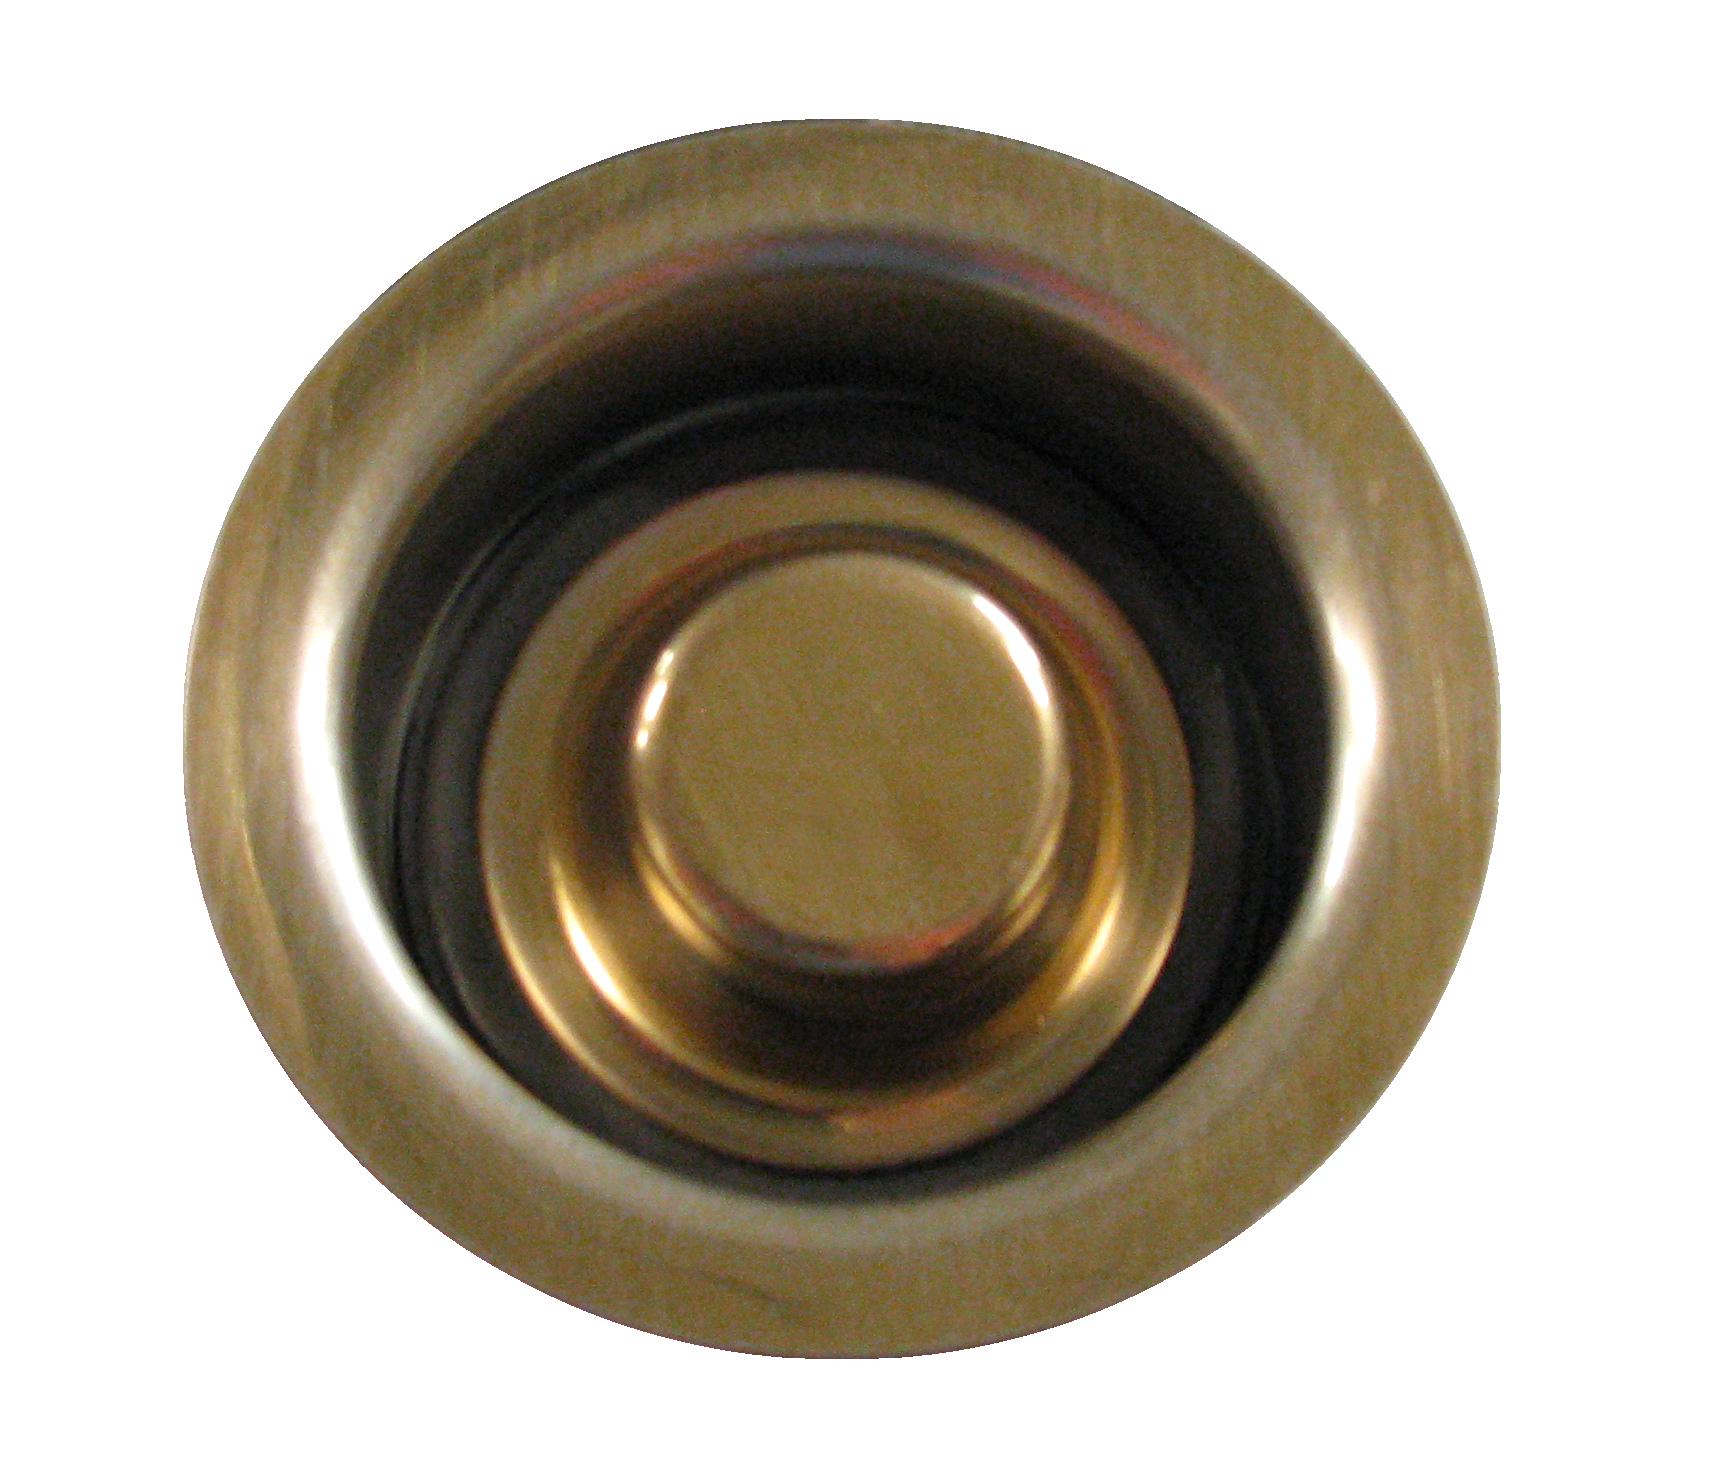 disposal fitting and matching plug, Medium Brass